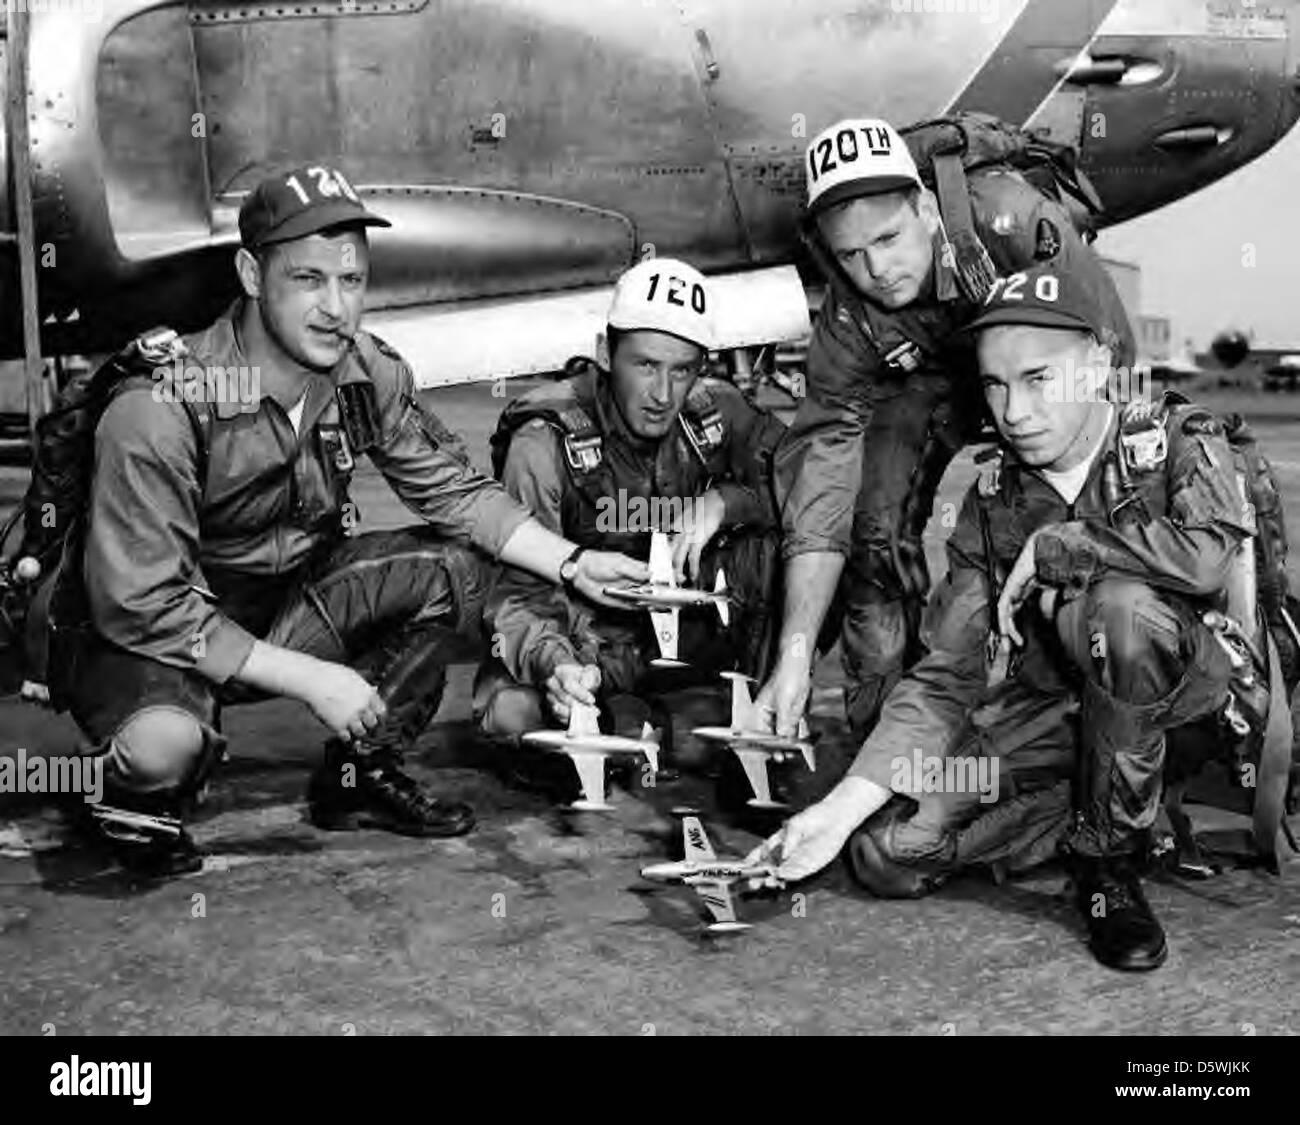 'Minute Men' ANG Jet Aerobatic Team along side their Lockheed F-80 'Shooting Star'. - Stock Image